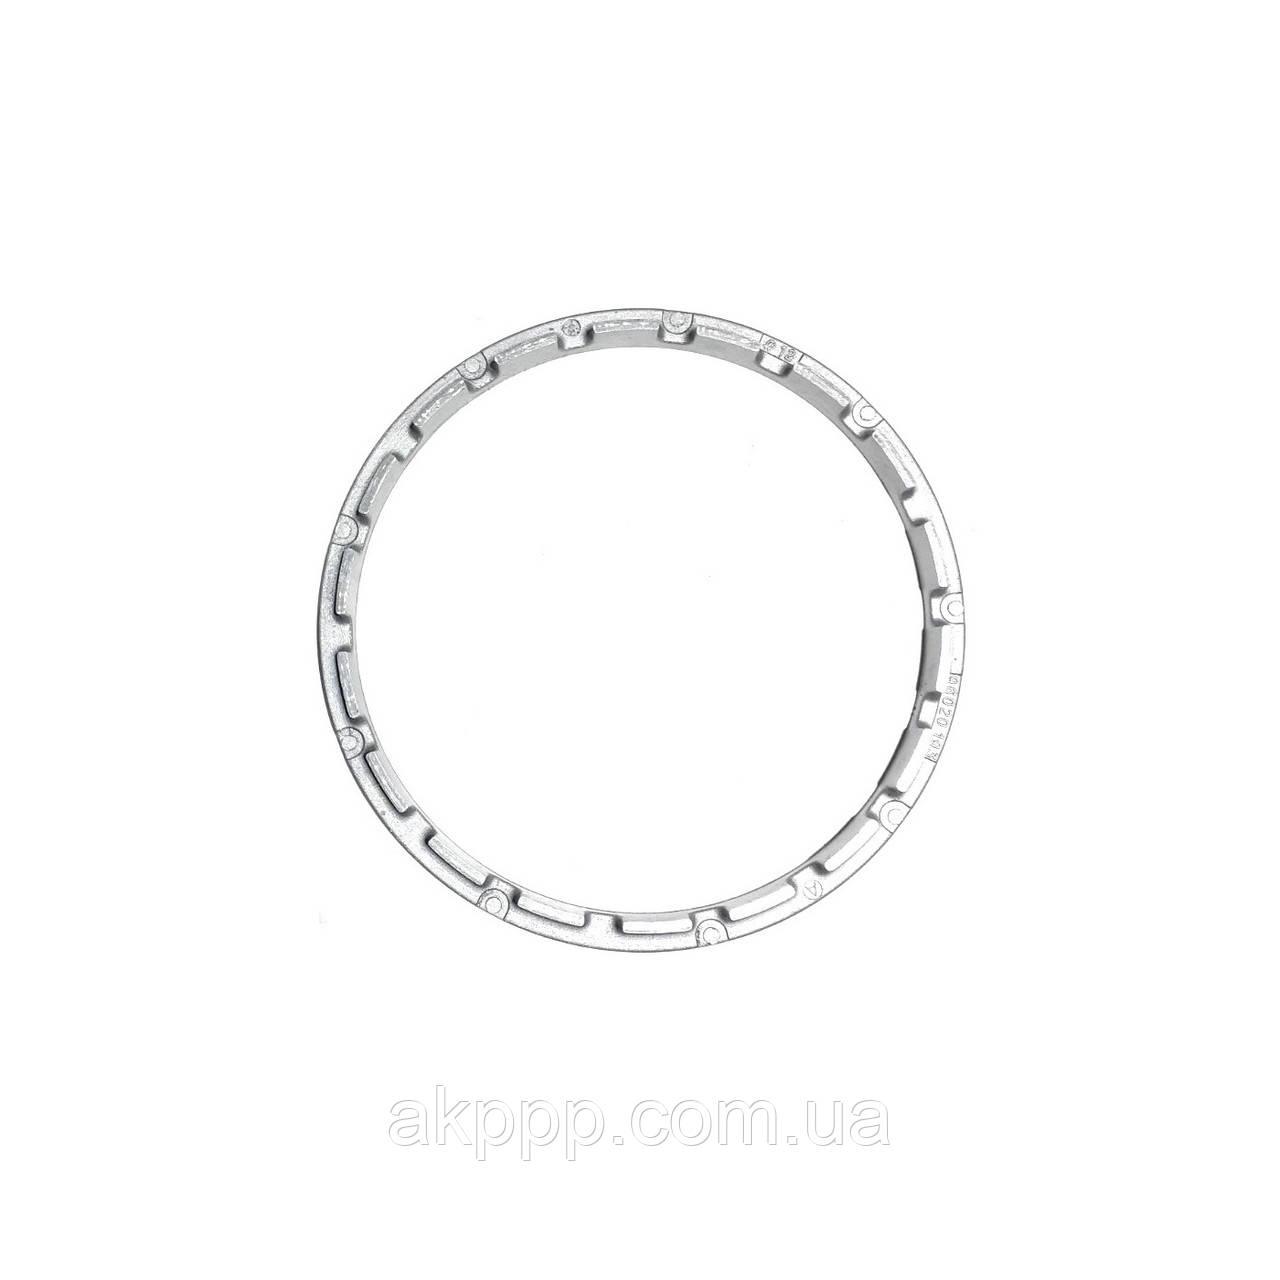 Опорное кольцо пакета 2nd Coast акпп 5L40E б/у